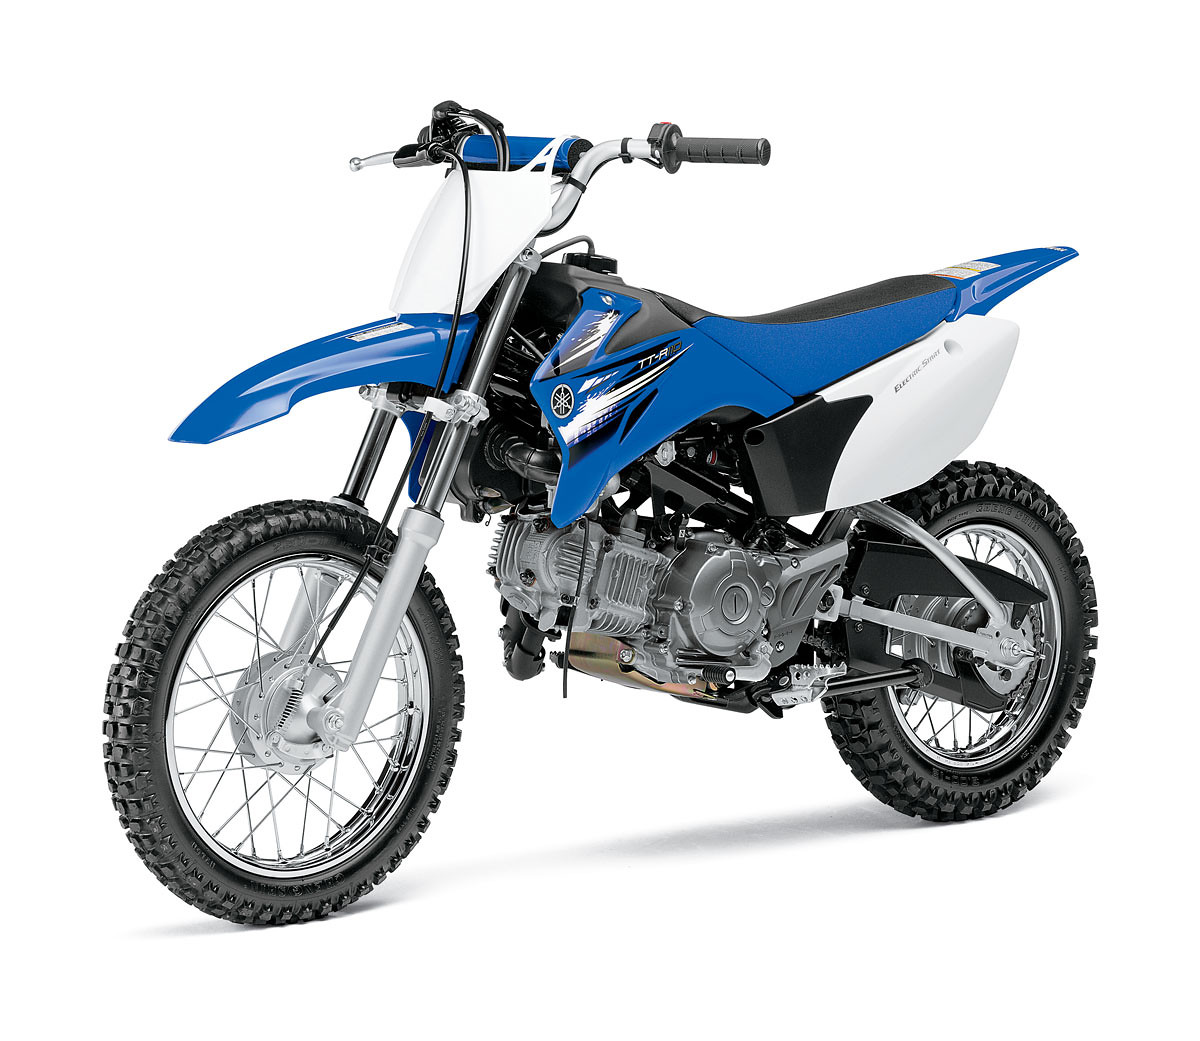 Yamaha Ttr Horsepower